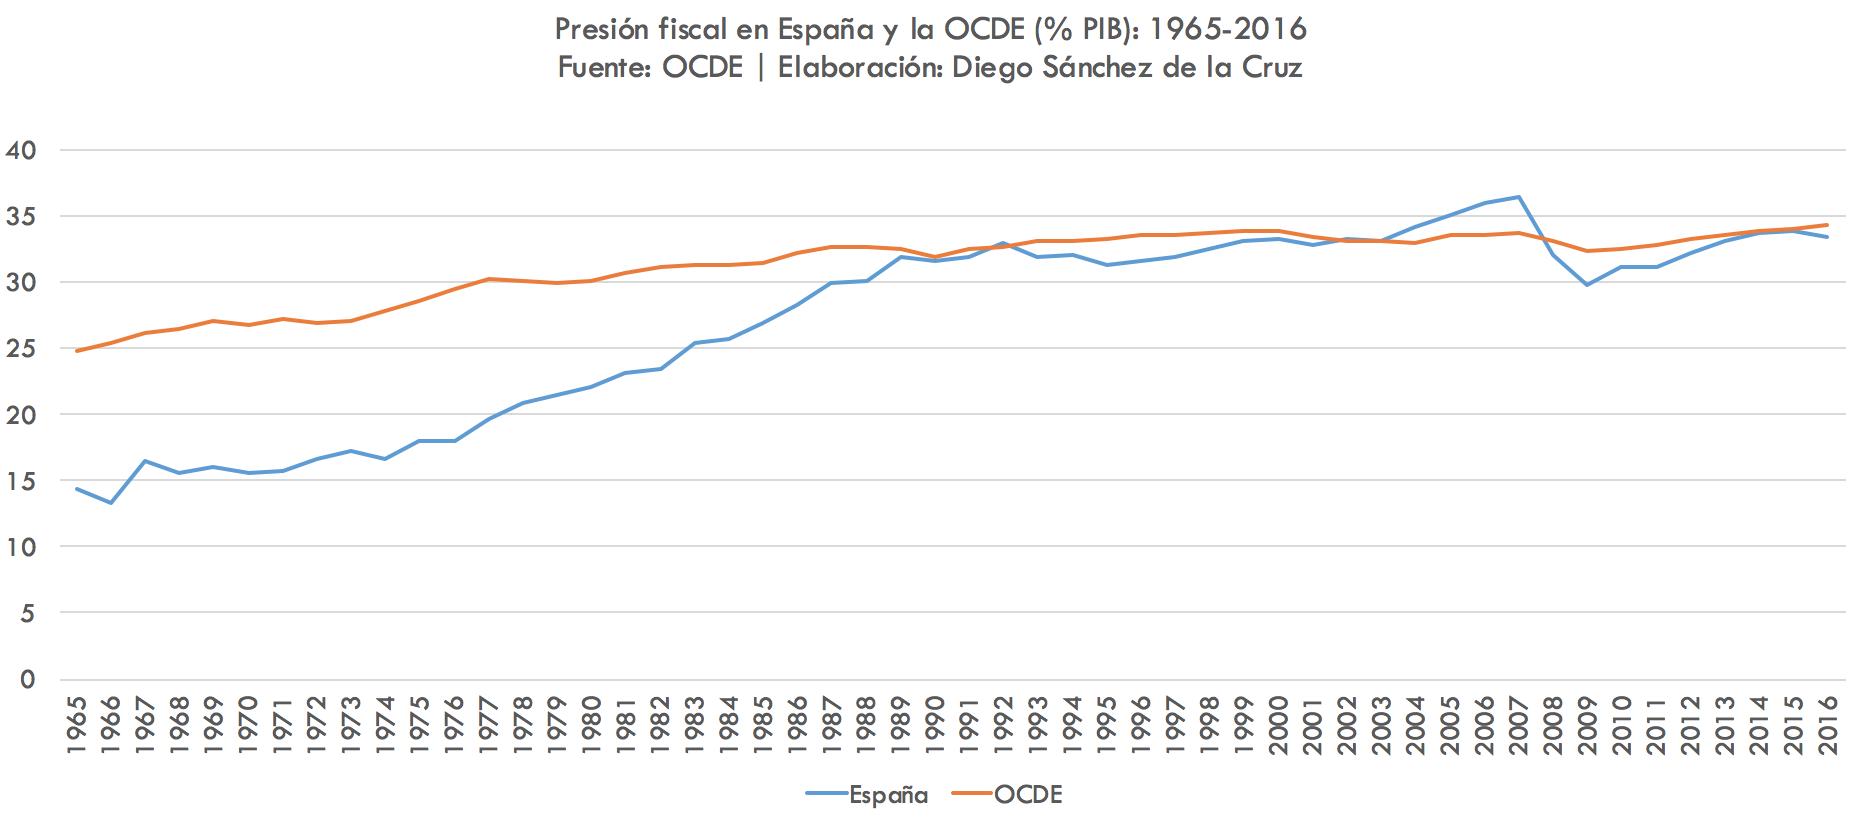 2-Presion-fiscal-Espana-OCDE.png